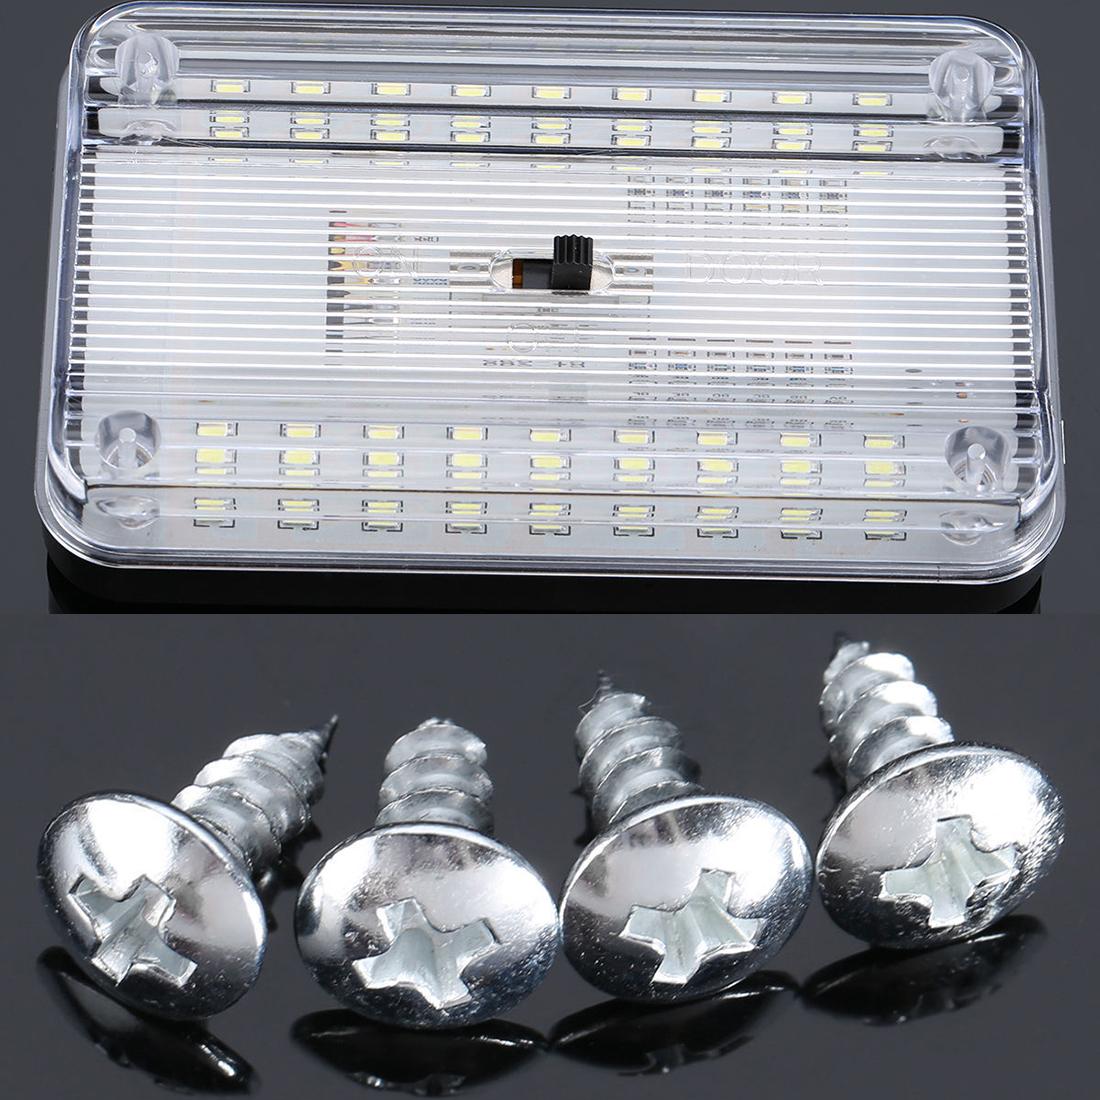 led white auto car van bus interior ceiling dome roof light lamp bulb kit